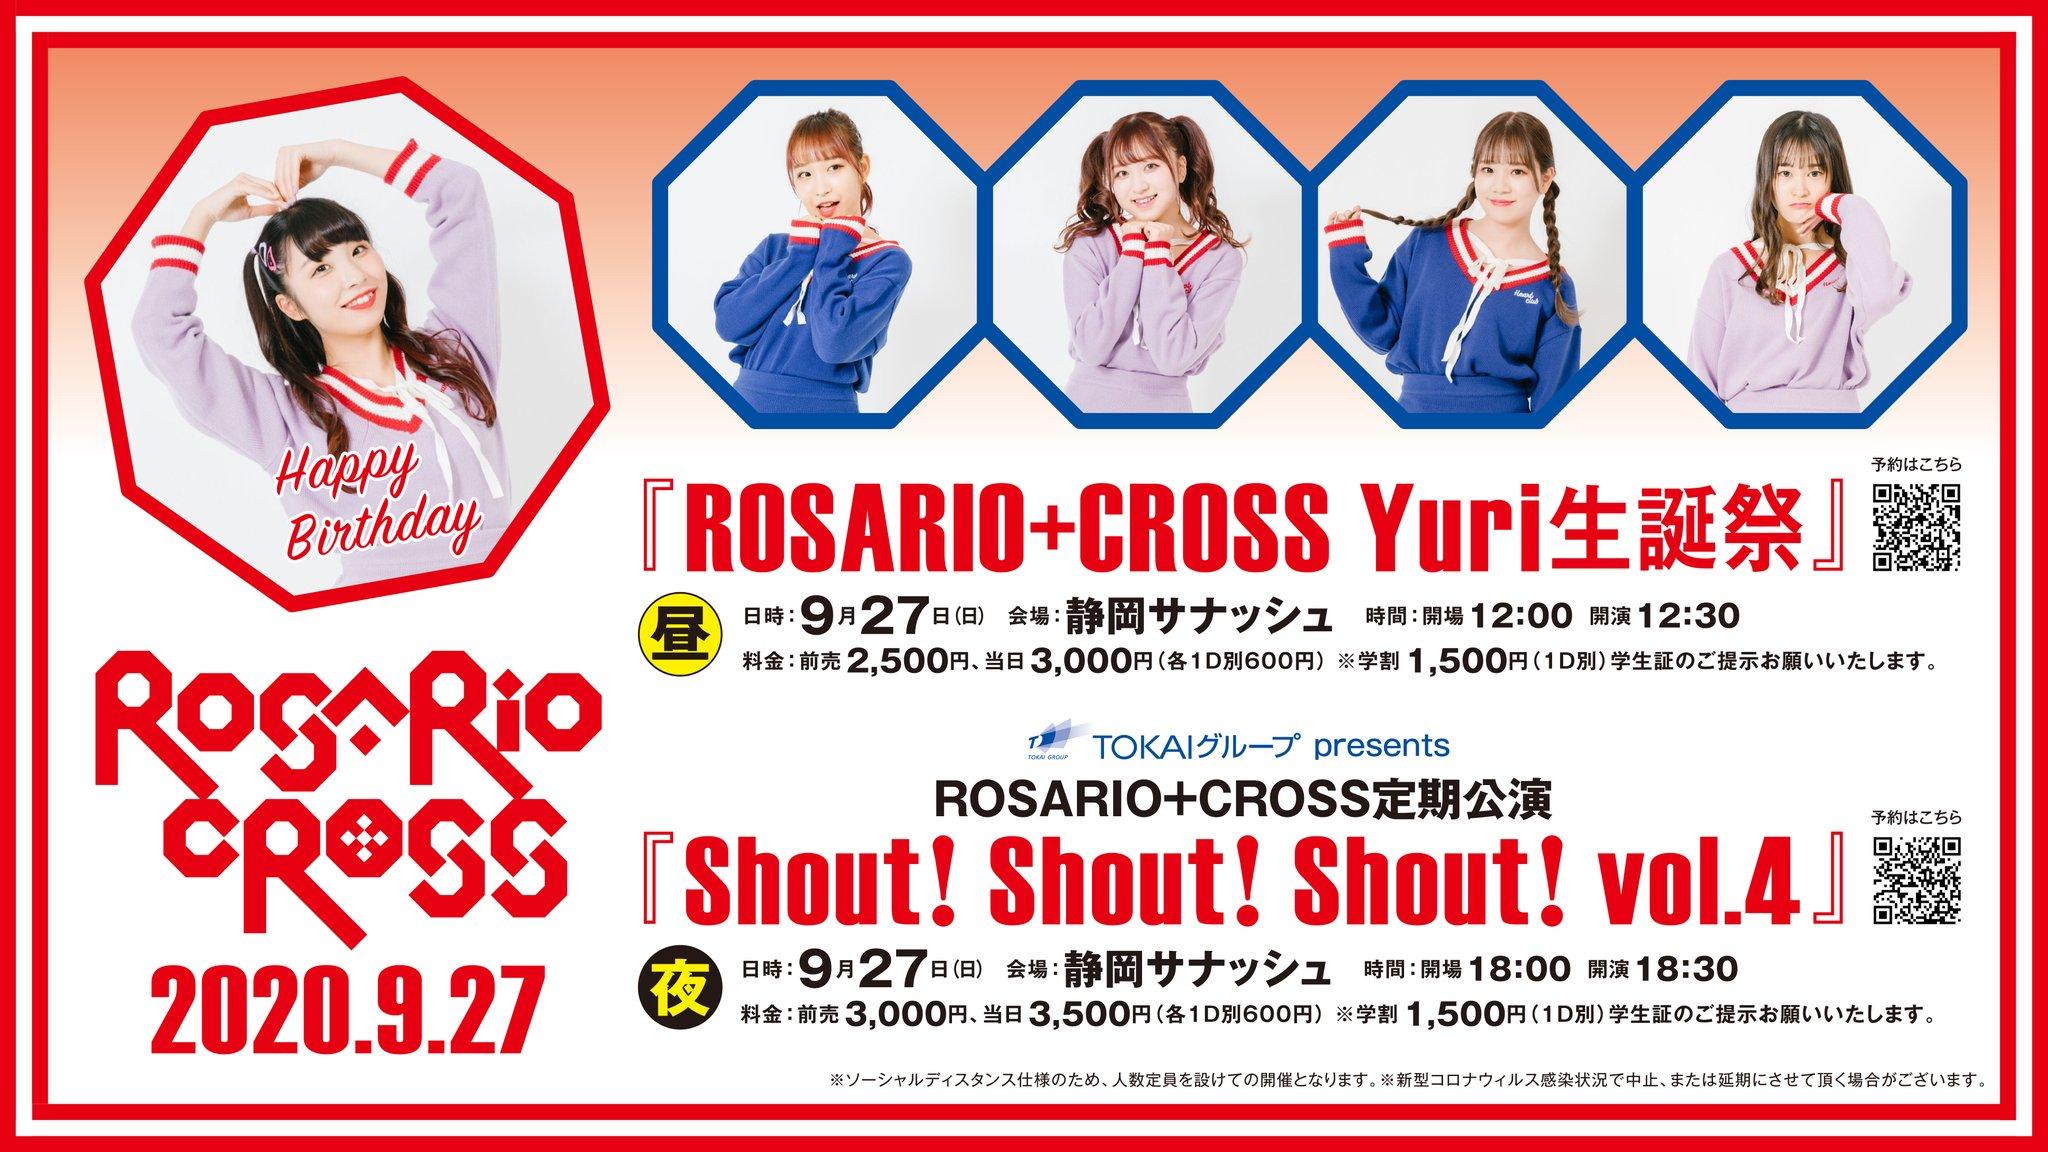 【ROSARIO+CROSS】昼公演「ROSARIO+CROSS Yuri生誕祭」